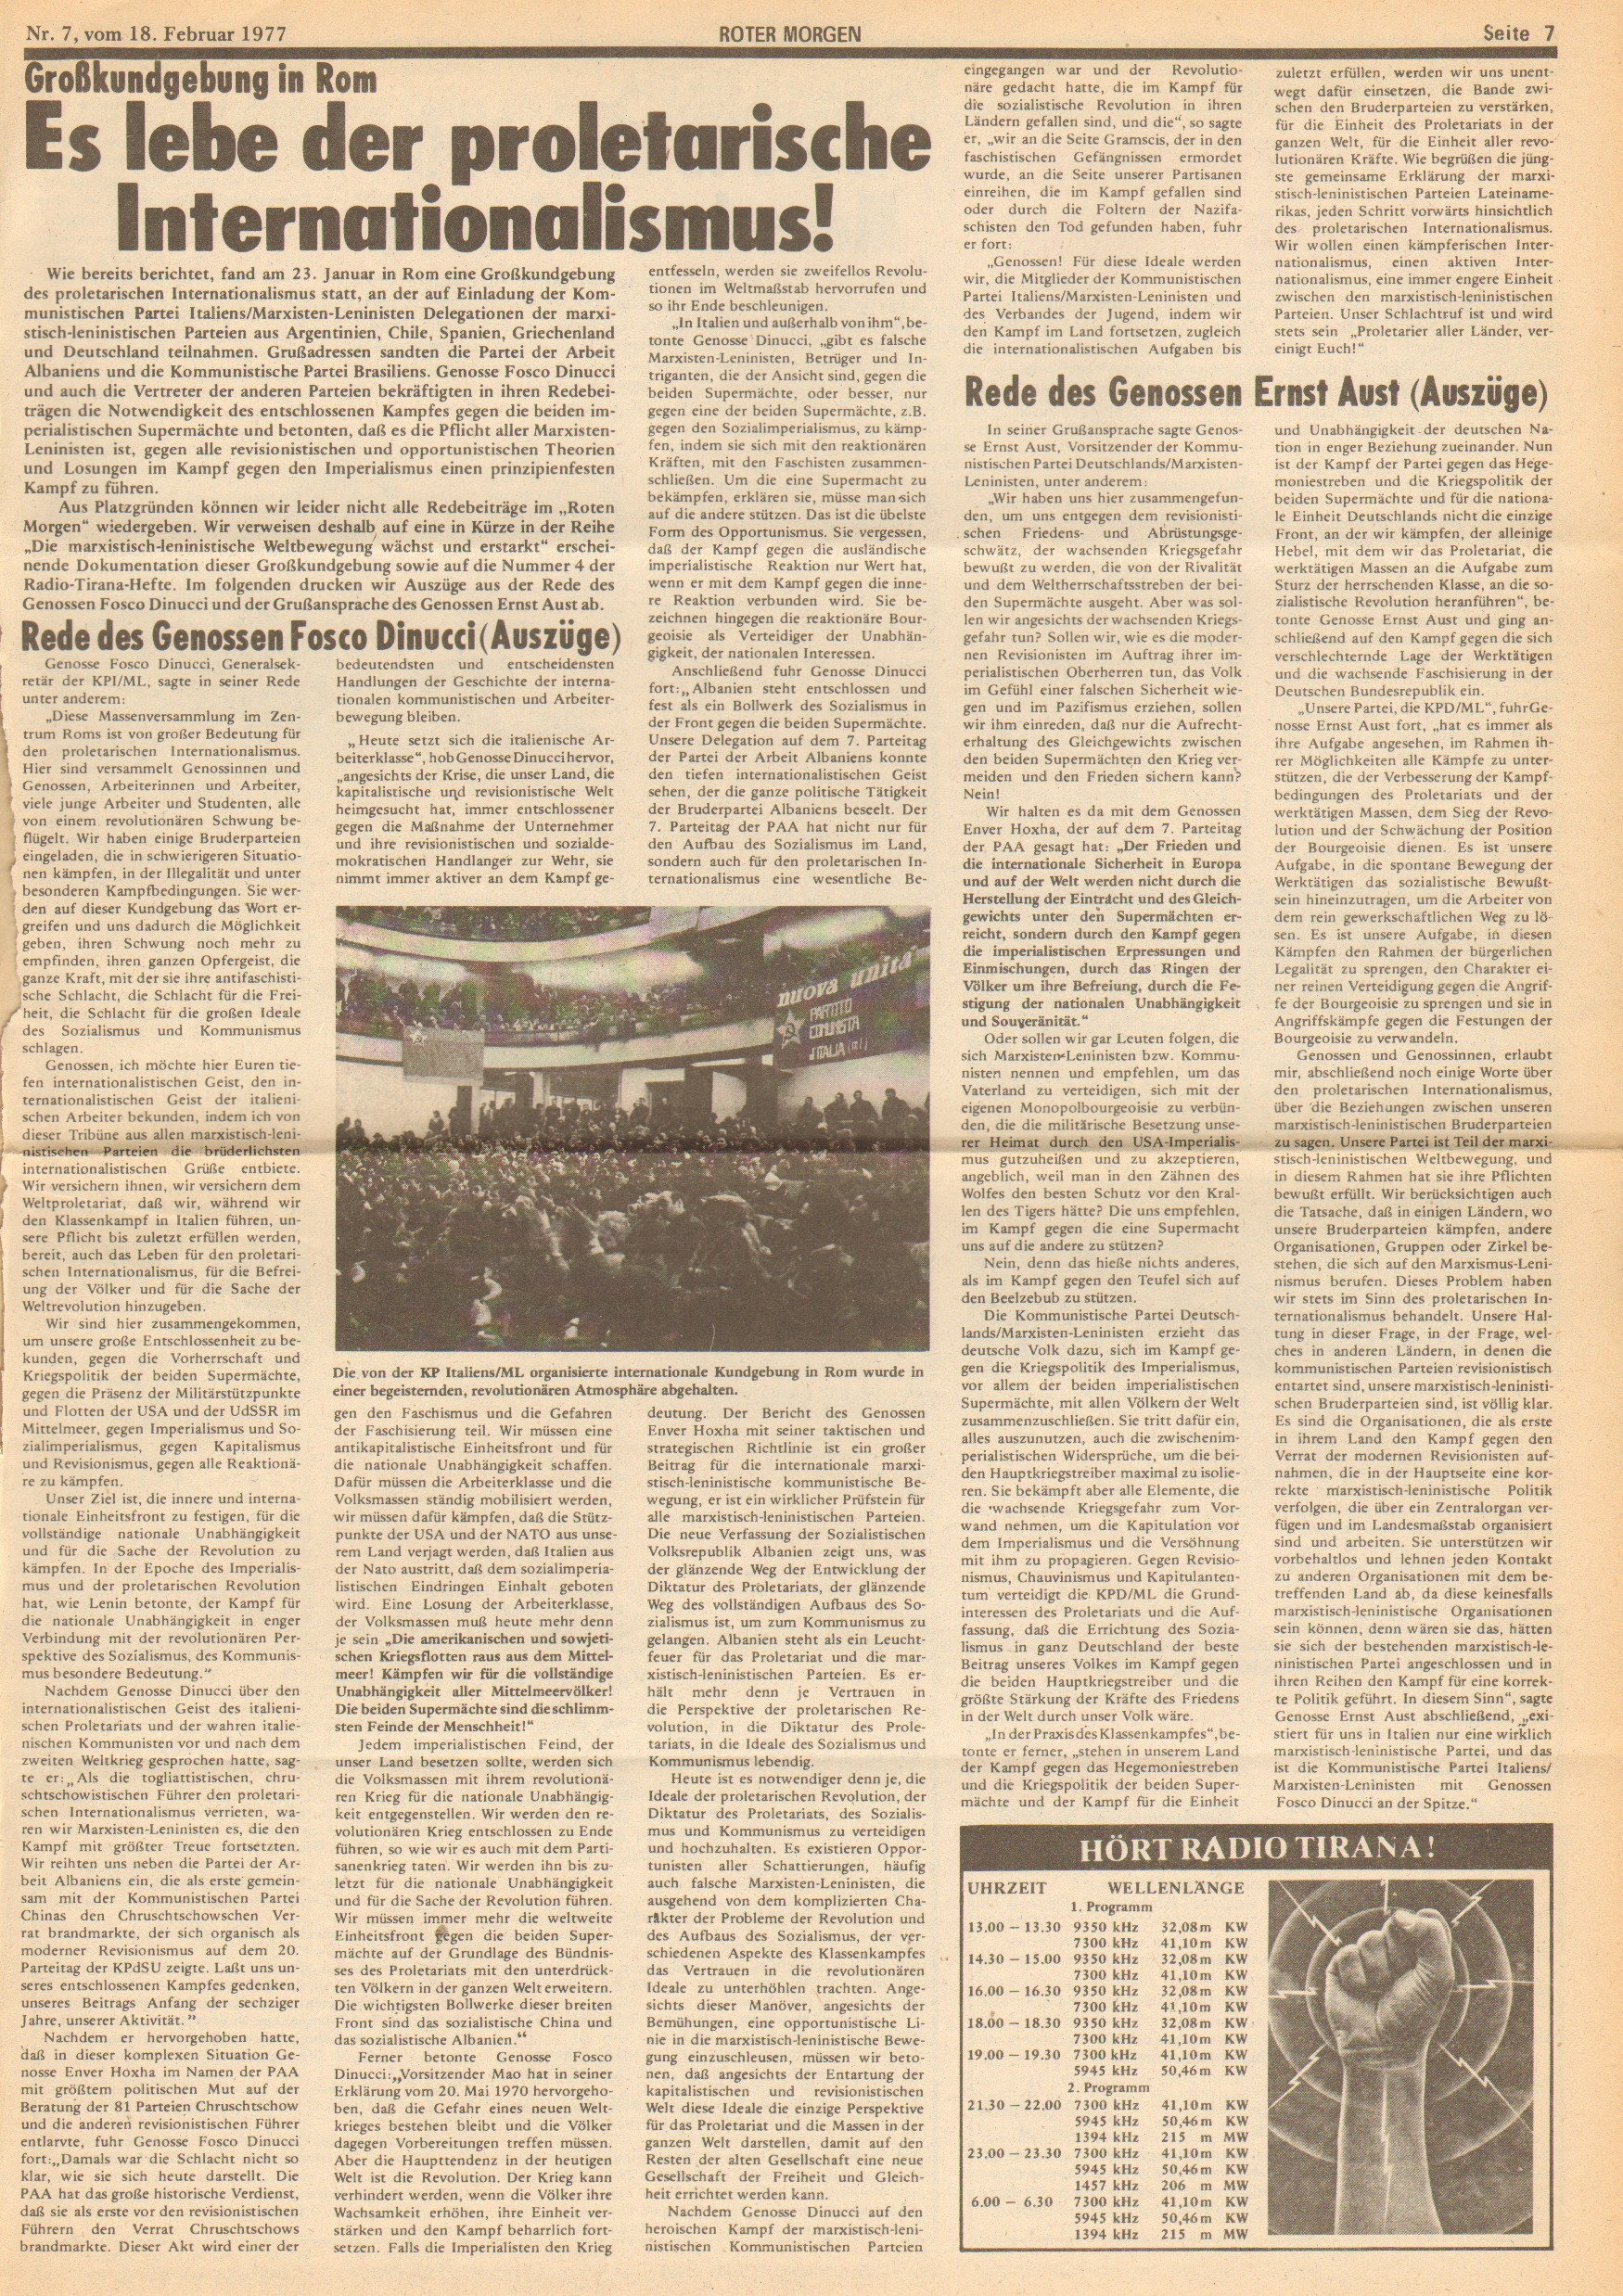 Roter Morgen, 11. Jg., 18. Februar 1977, Nr. 7, Seite 7